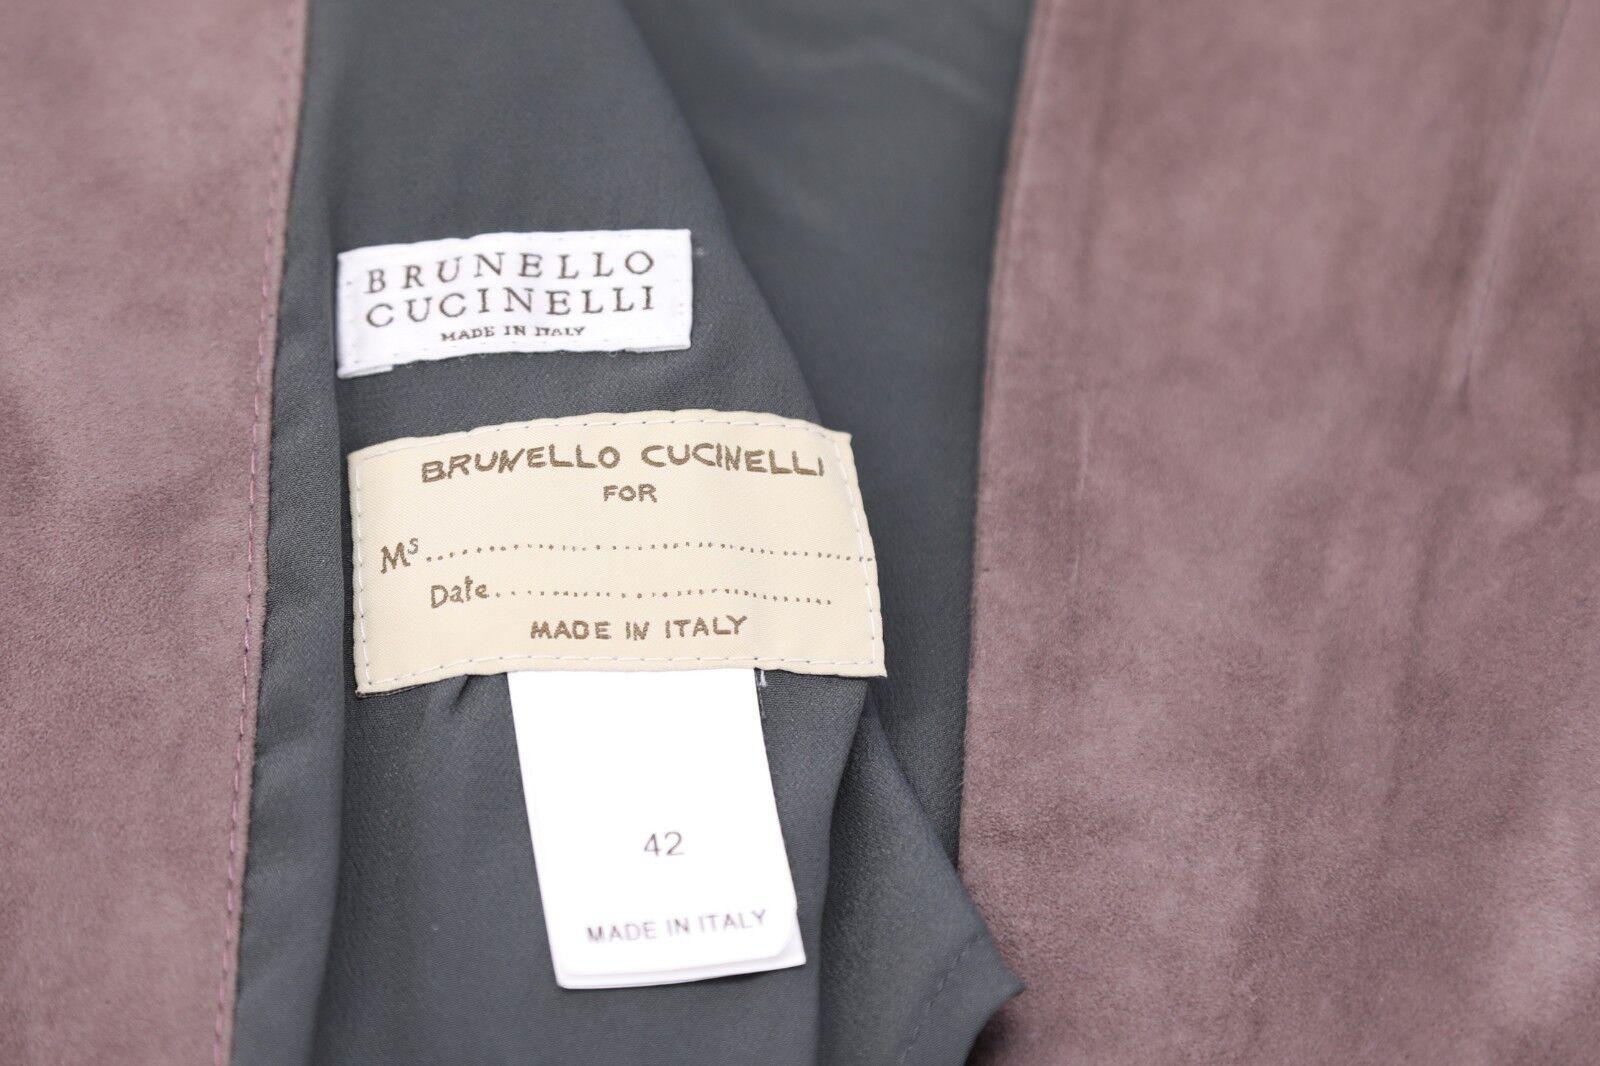 NWT 5275 Brunello Cucinelli Women Leather Suede Monili Bead Bead Bead Collar Vest 42M A186 be2f21